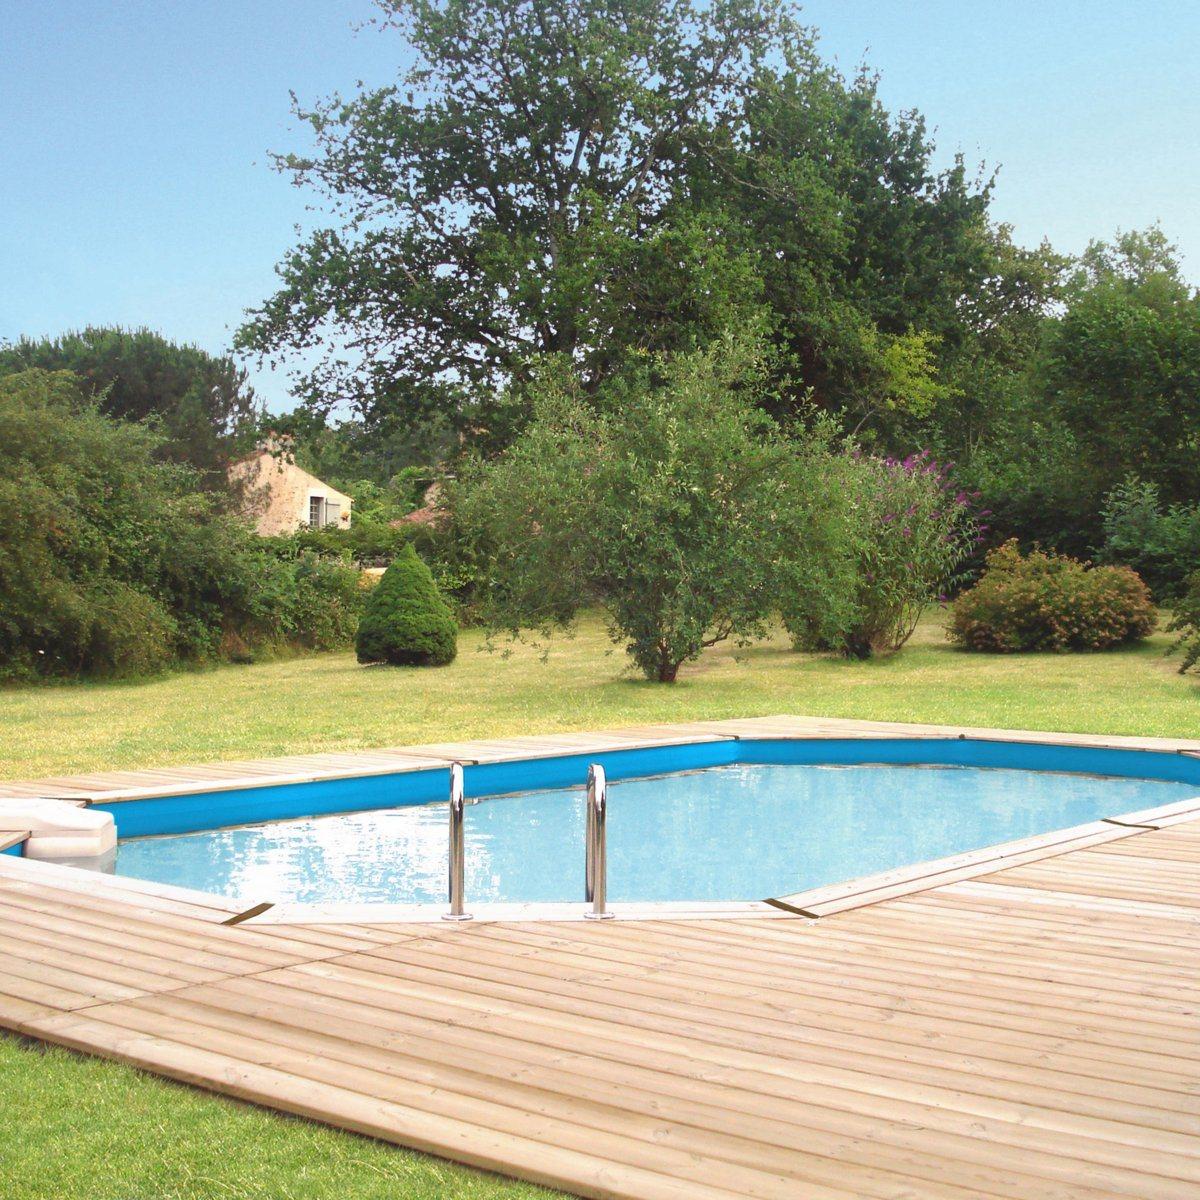 J 39 ai descendu dans mon jardin une piscine dans mon jardin - Prix moyen piscine enterree ...